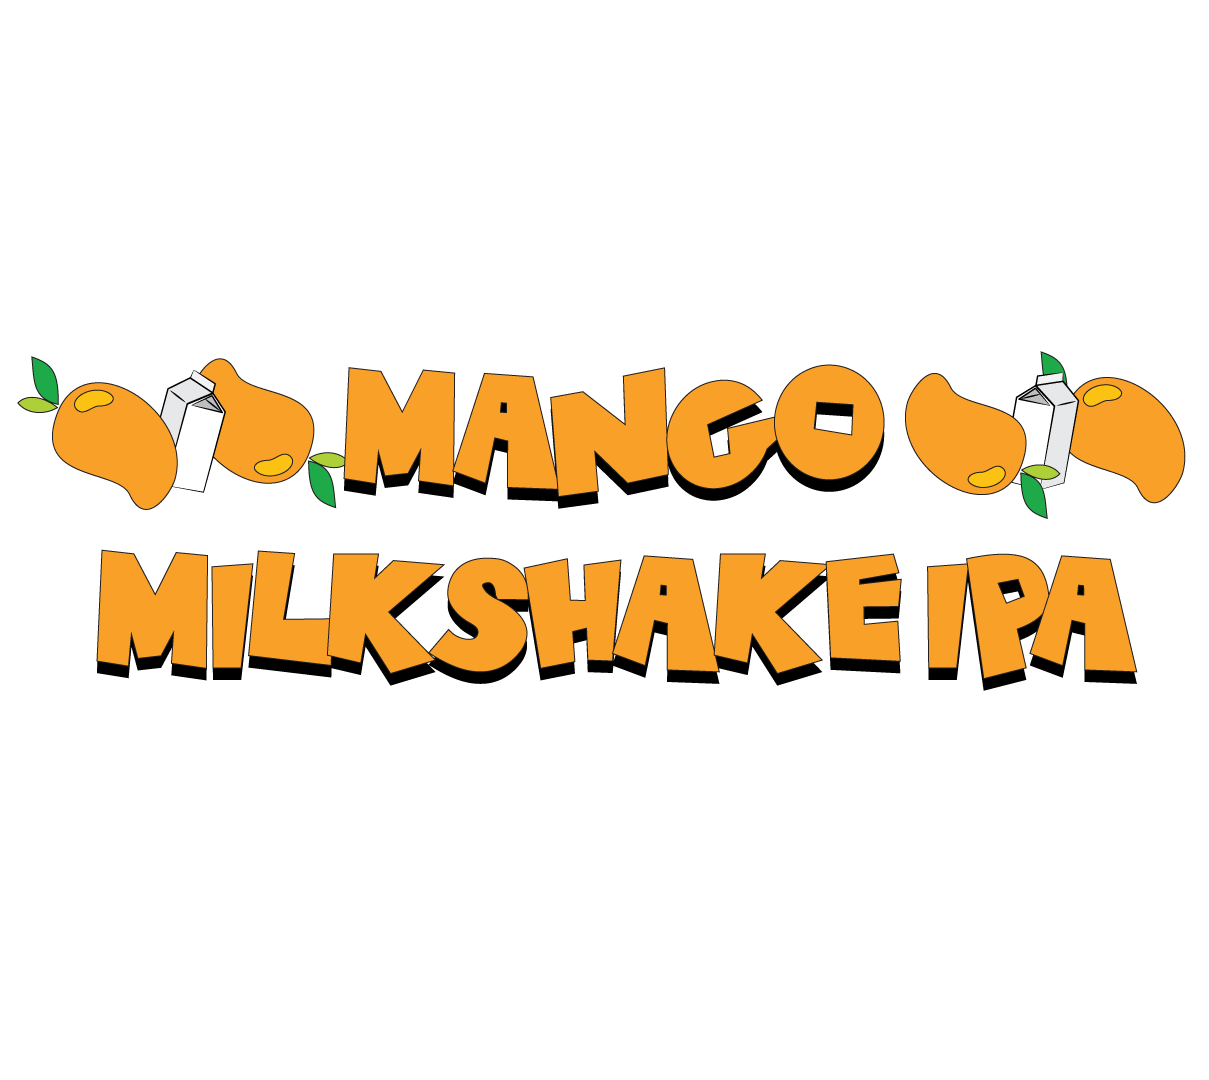 mango-milkshake-web-logo - Modist Brewing Co